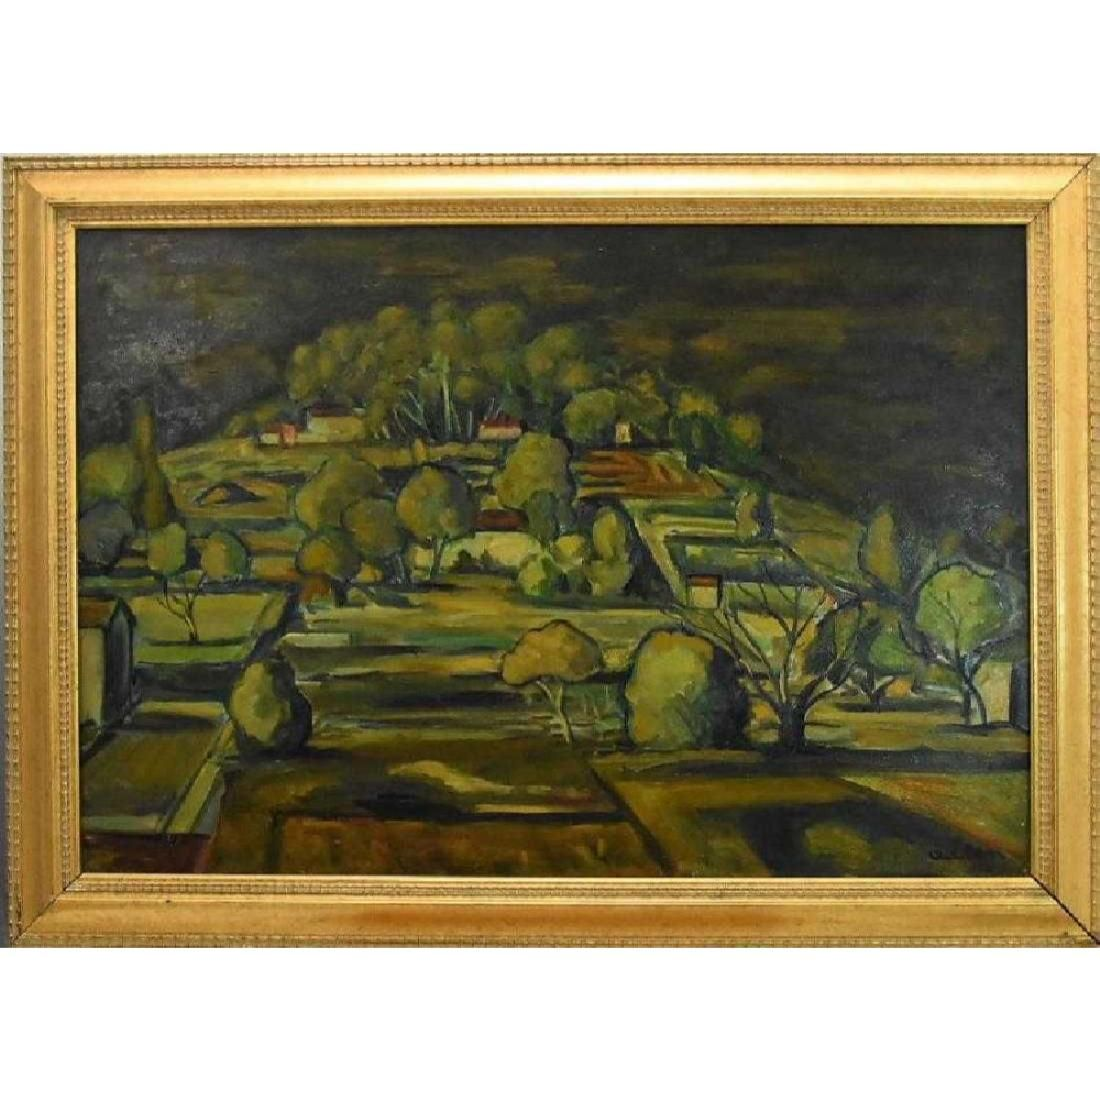 Michel Adlen Original Oil on Canvas Painting